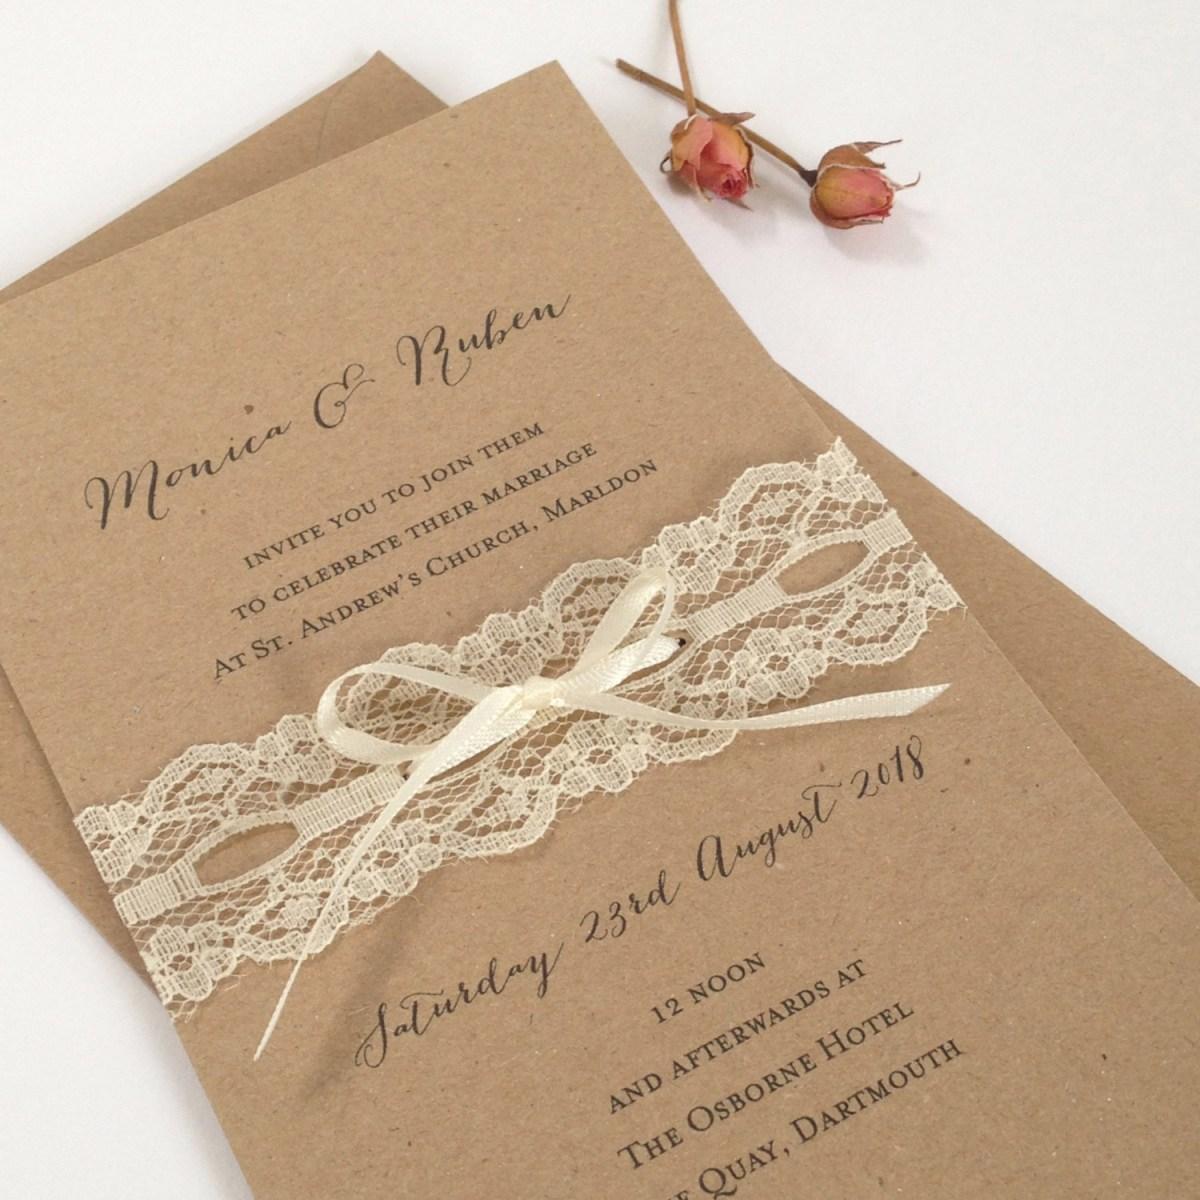 Rustic Lace Wedding Invitations Lace Wedding Invitation Rustic Lace Wedding Invites Rustic Etsy